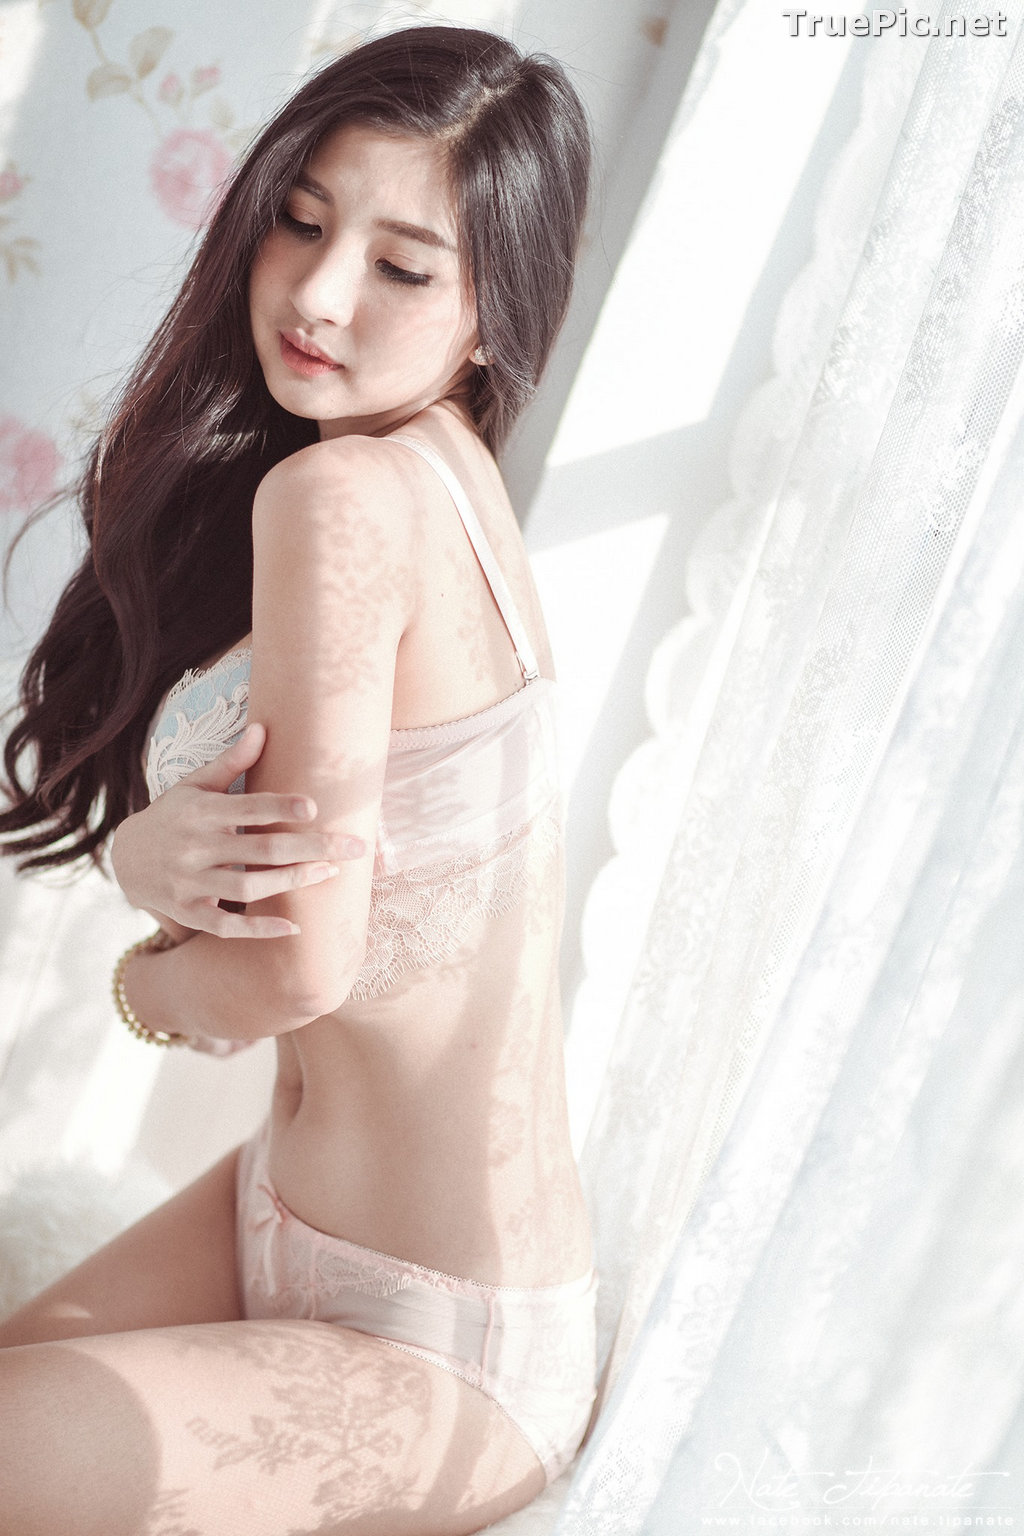 Image Thailand Model - Pattamaporn Keawkum - Sexy Sleepwear and Lingerie - TruePic.net - Picture-3